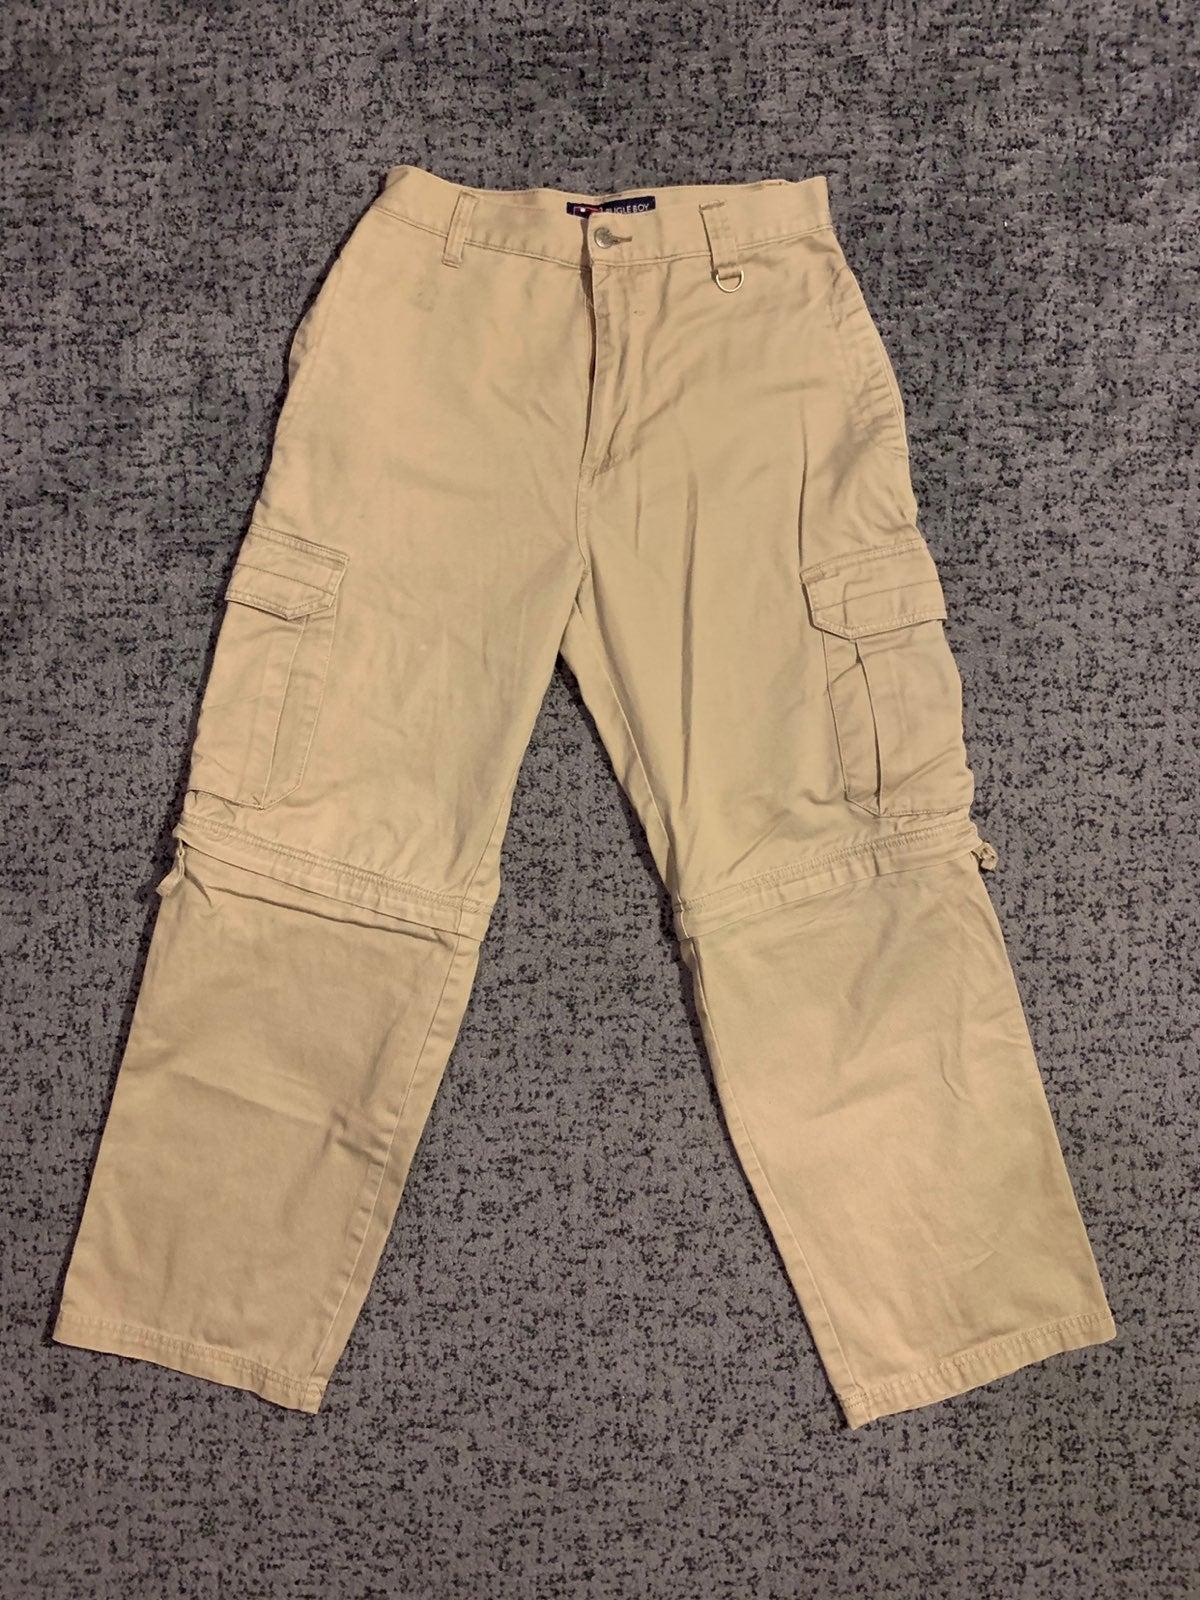 Bugle Boy Cargo Pants/Shorts